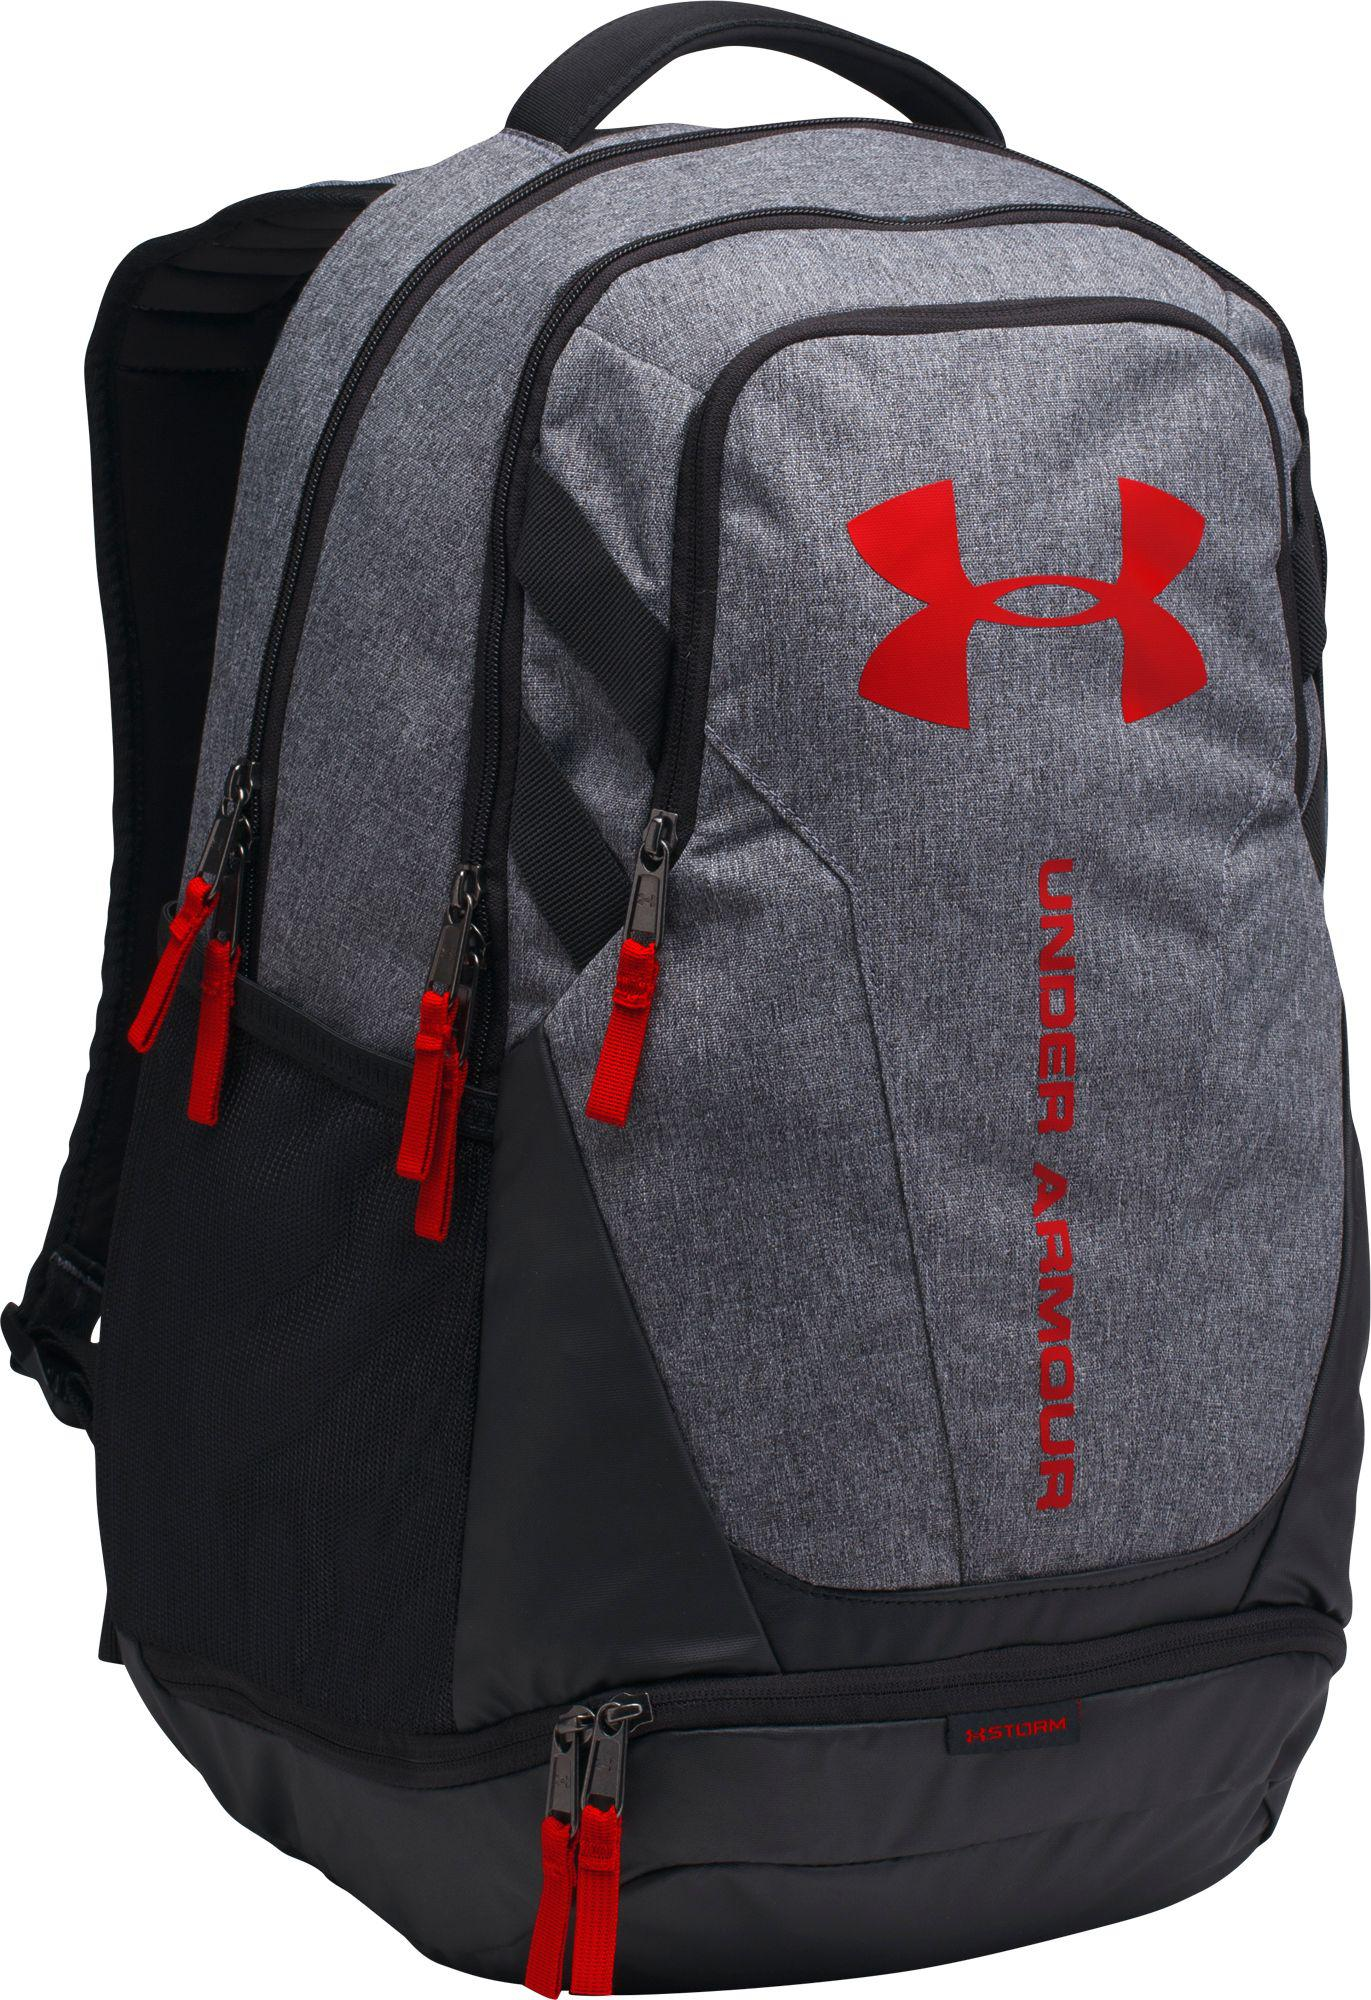 8c5a25e73e8 Lyst - Under Armour Hustle 3.0 Backpack in Black for Men